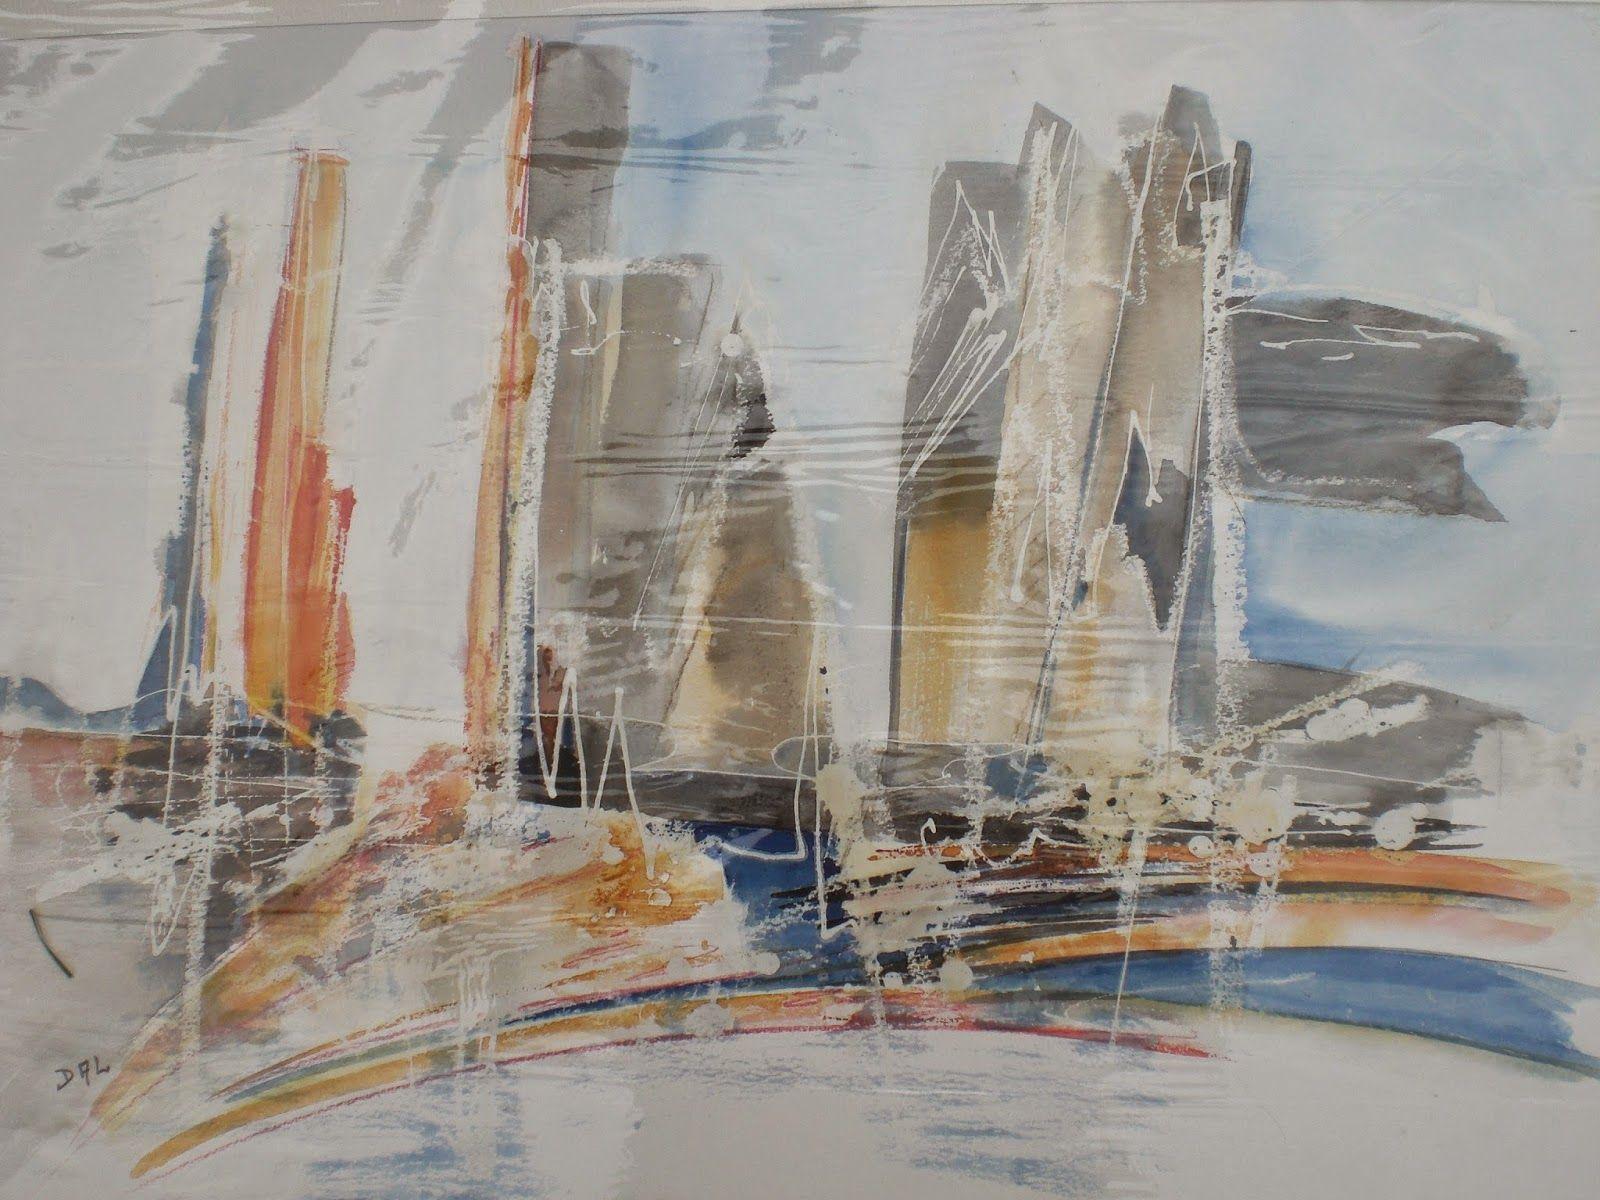 4 - Aquarelles abstraites | Aquarelle abstraite, Peinture abstraite, Aquarelle